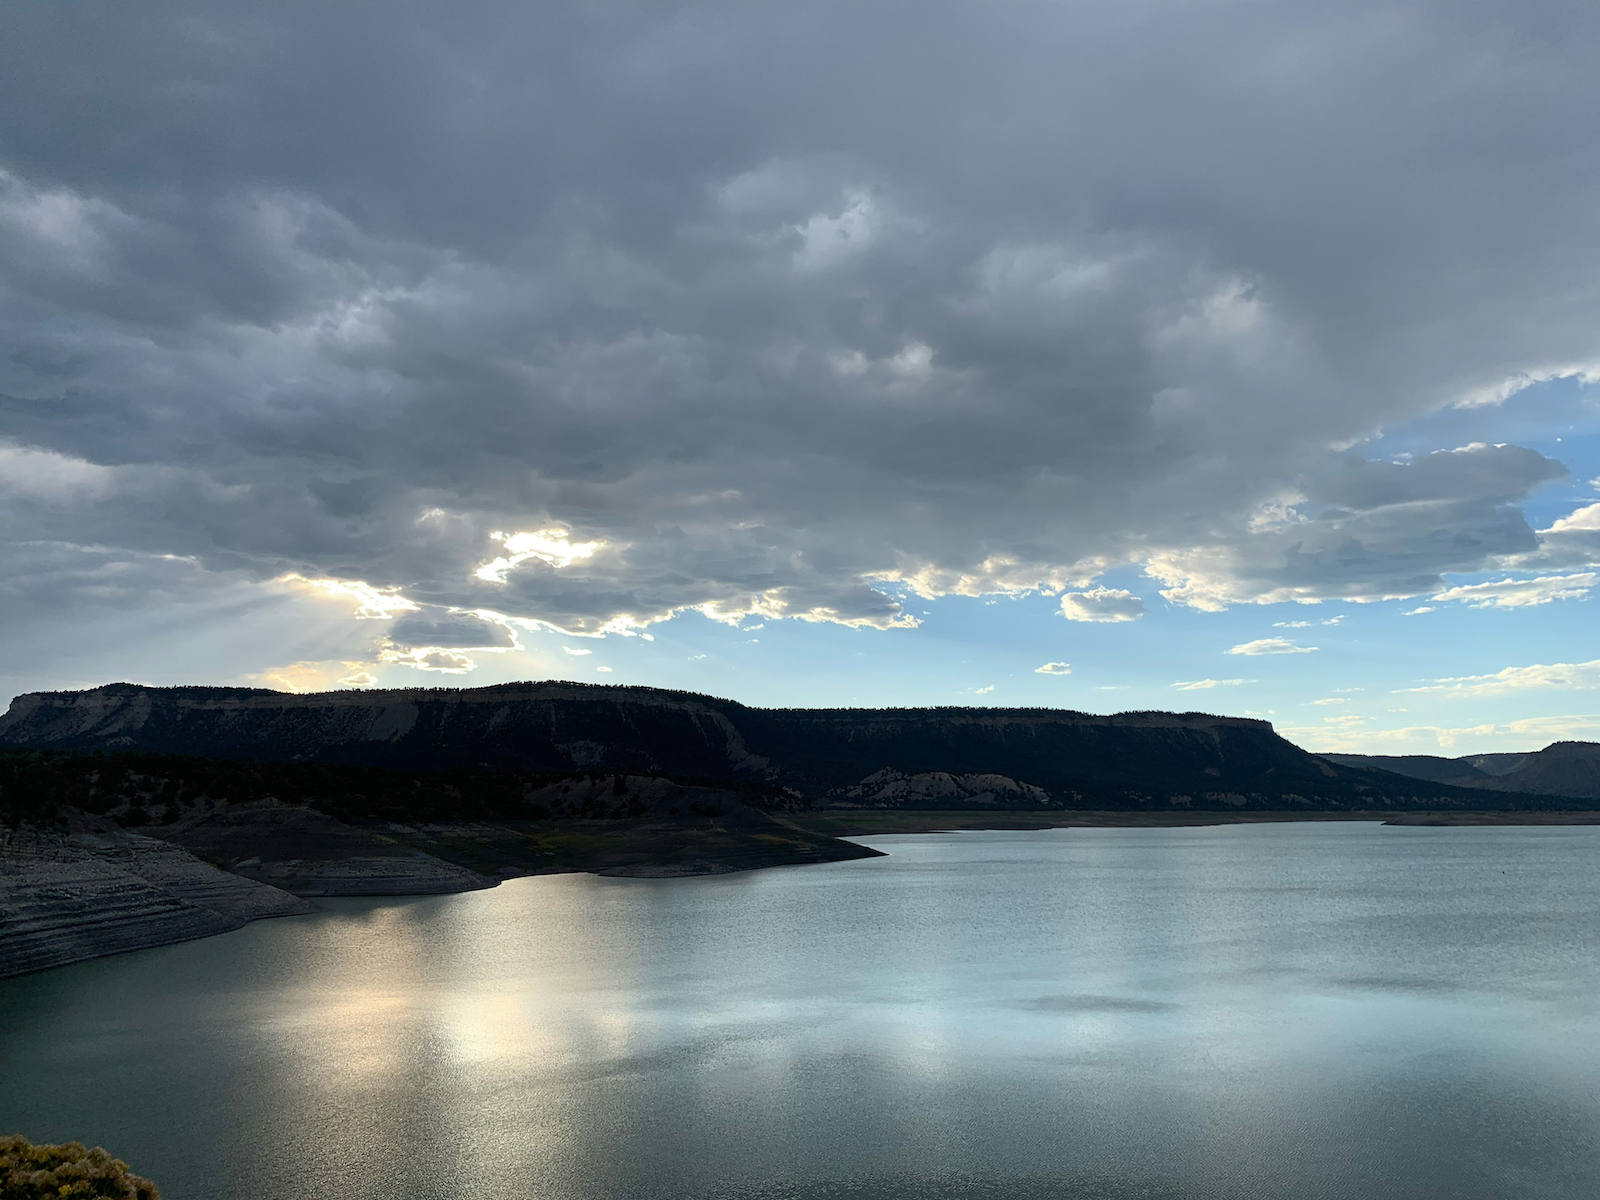 Yerandy Hernandez, Shadowy Lake